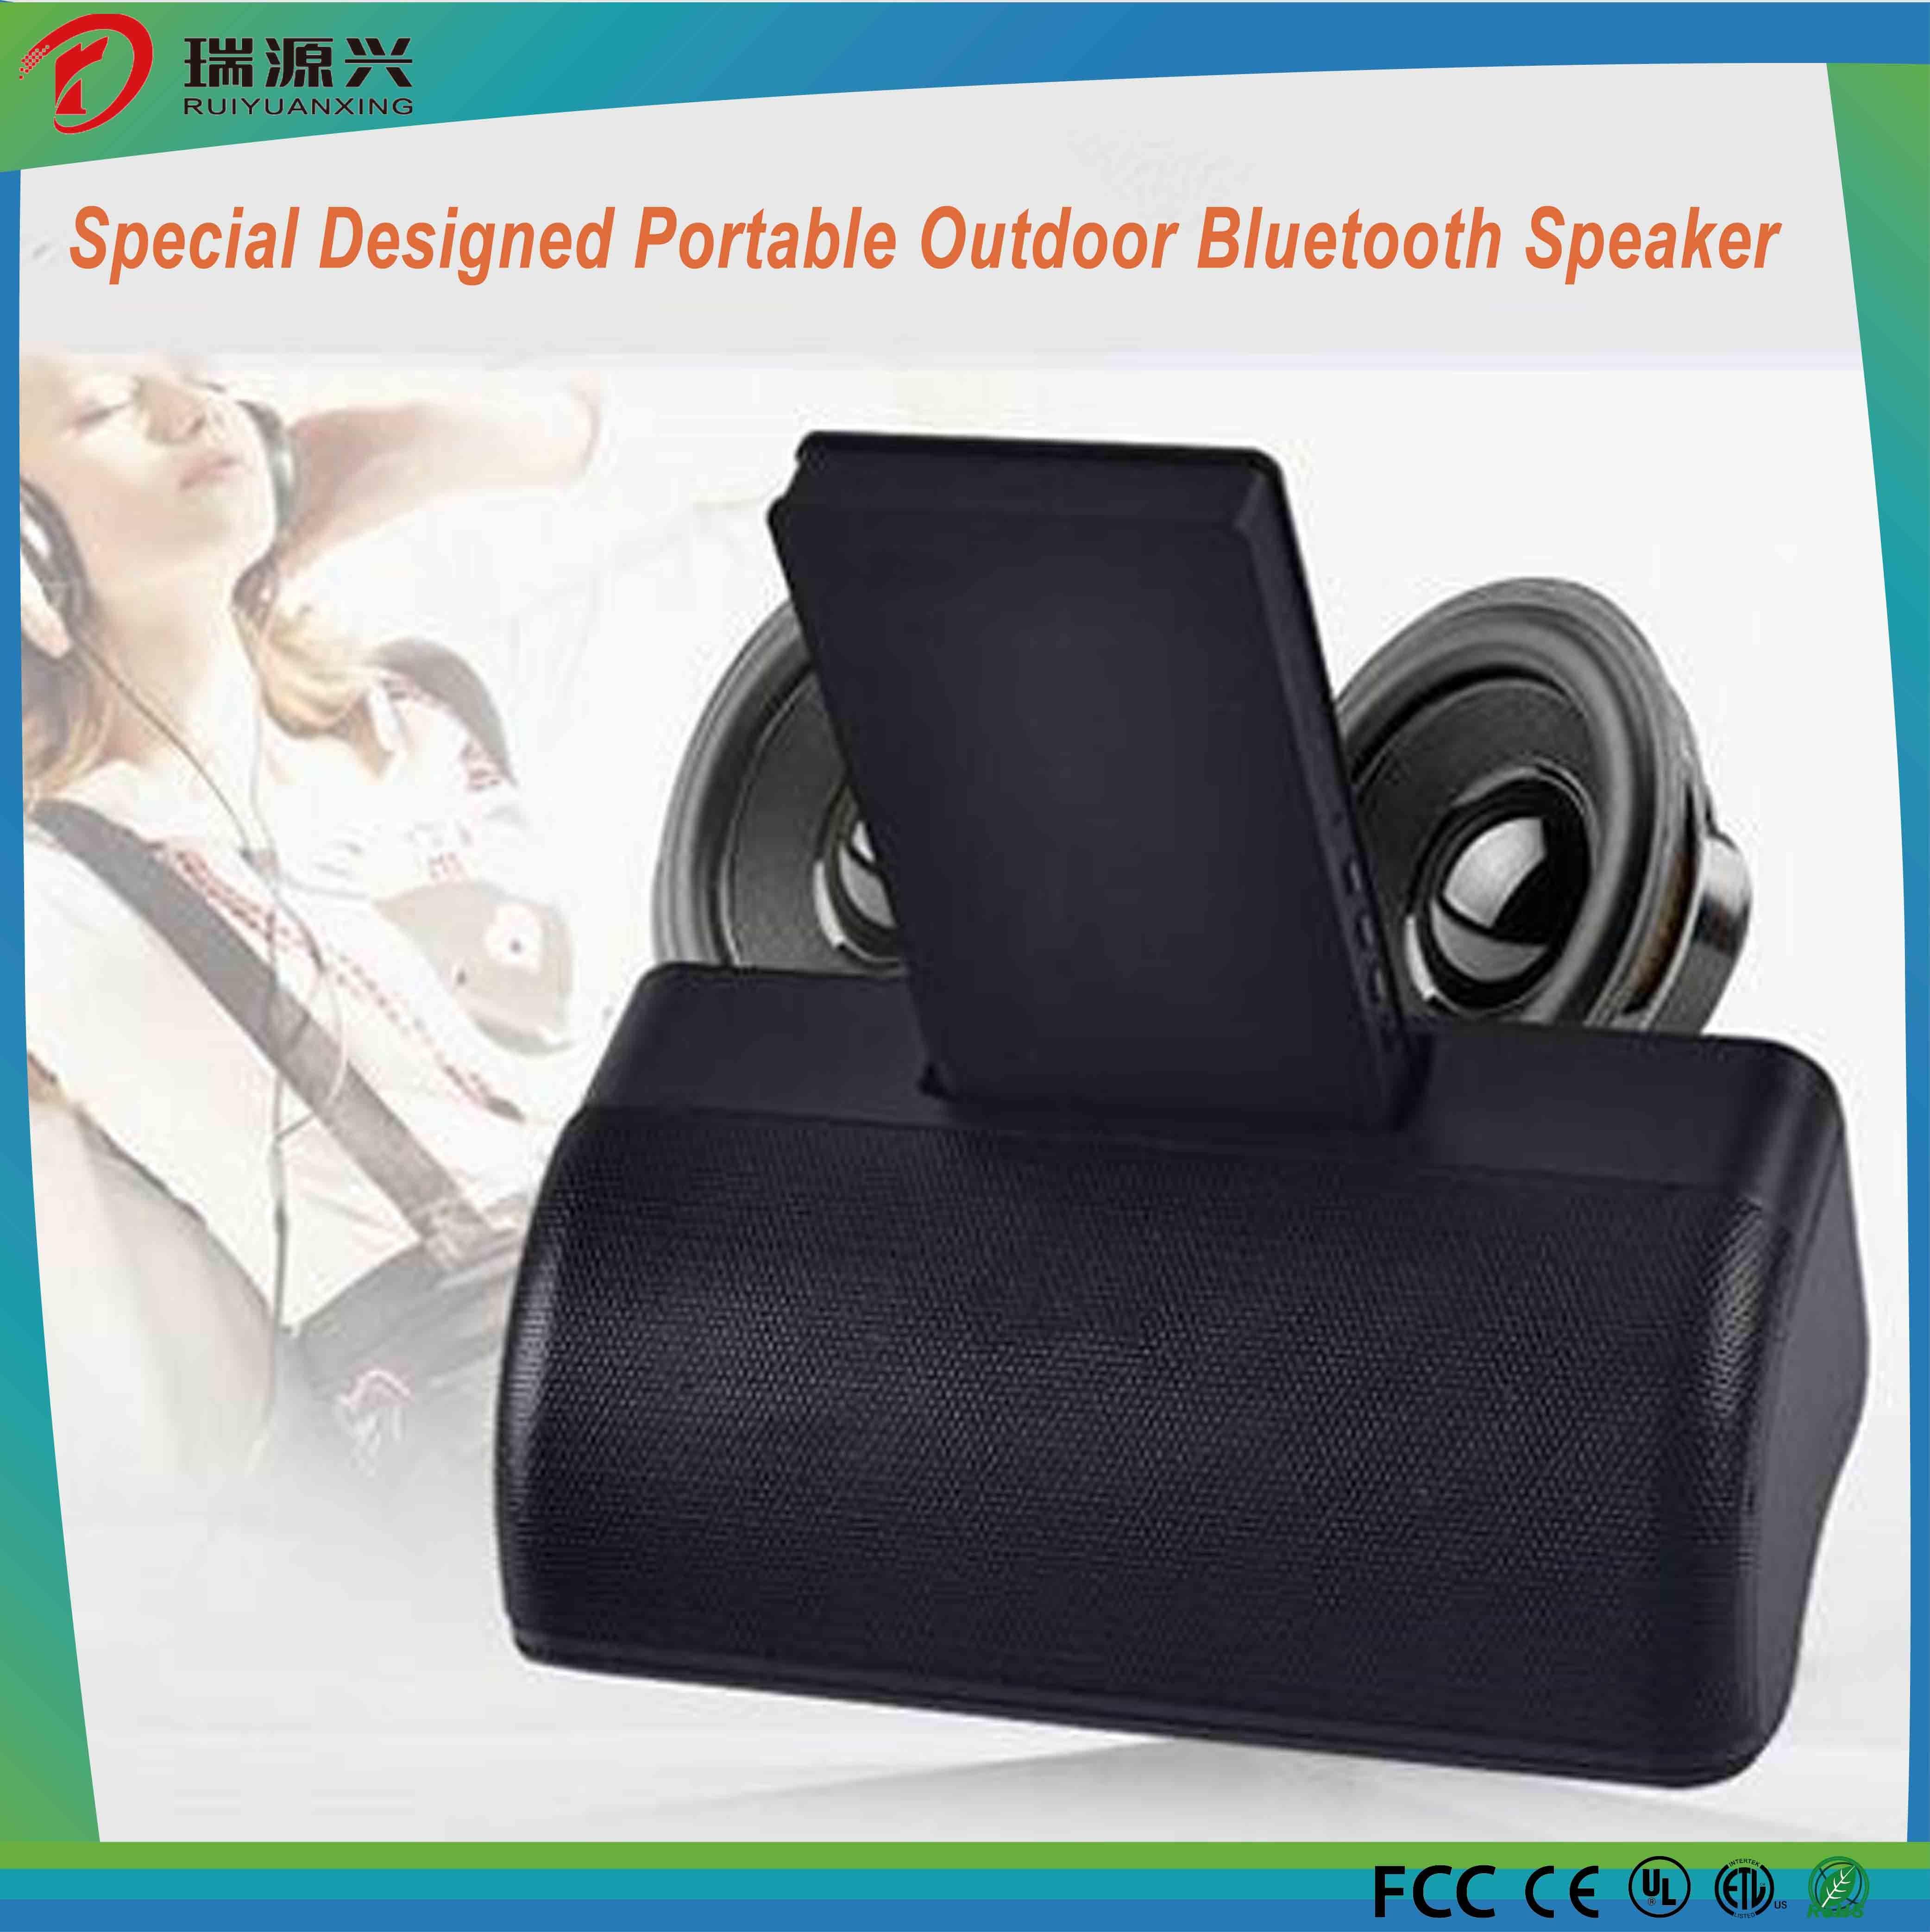 Special Designed Portable Outdoor Bluetooth Speaker